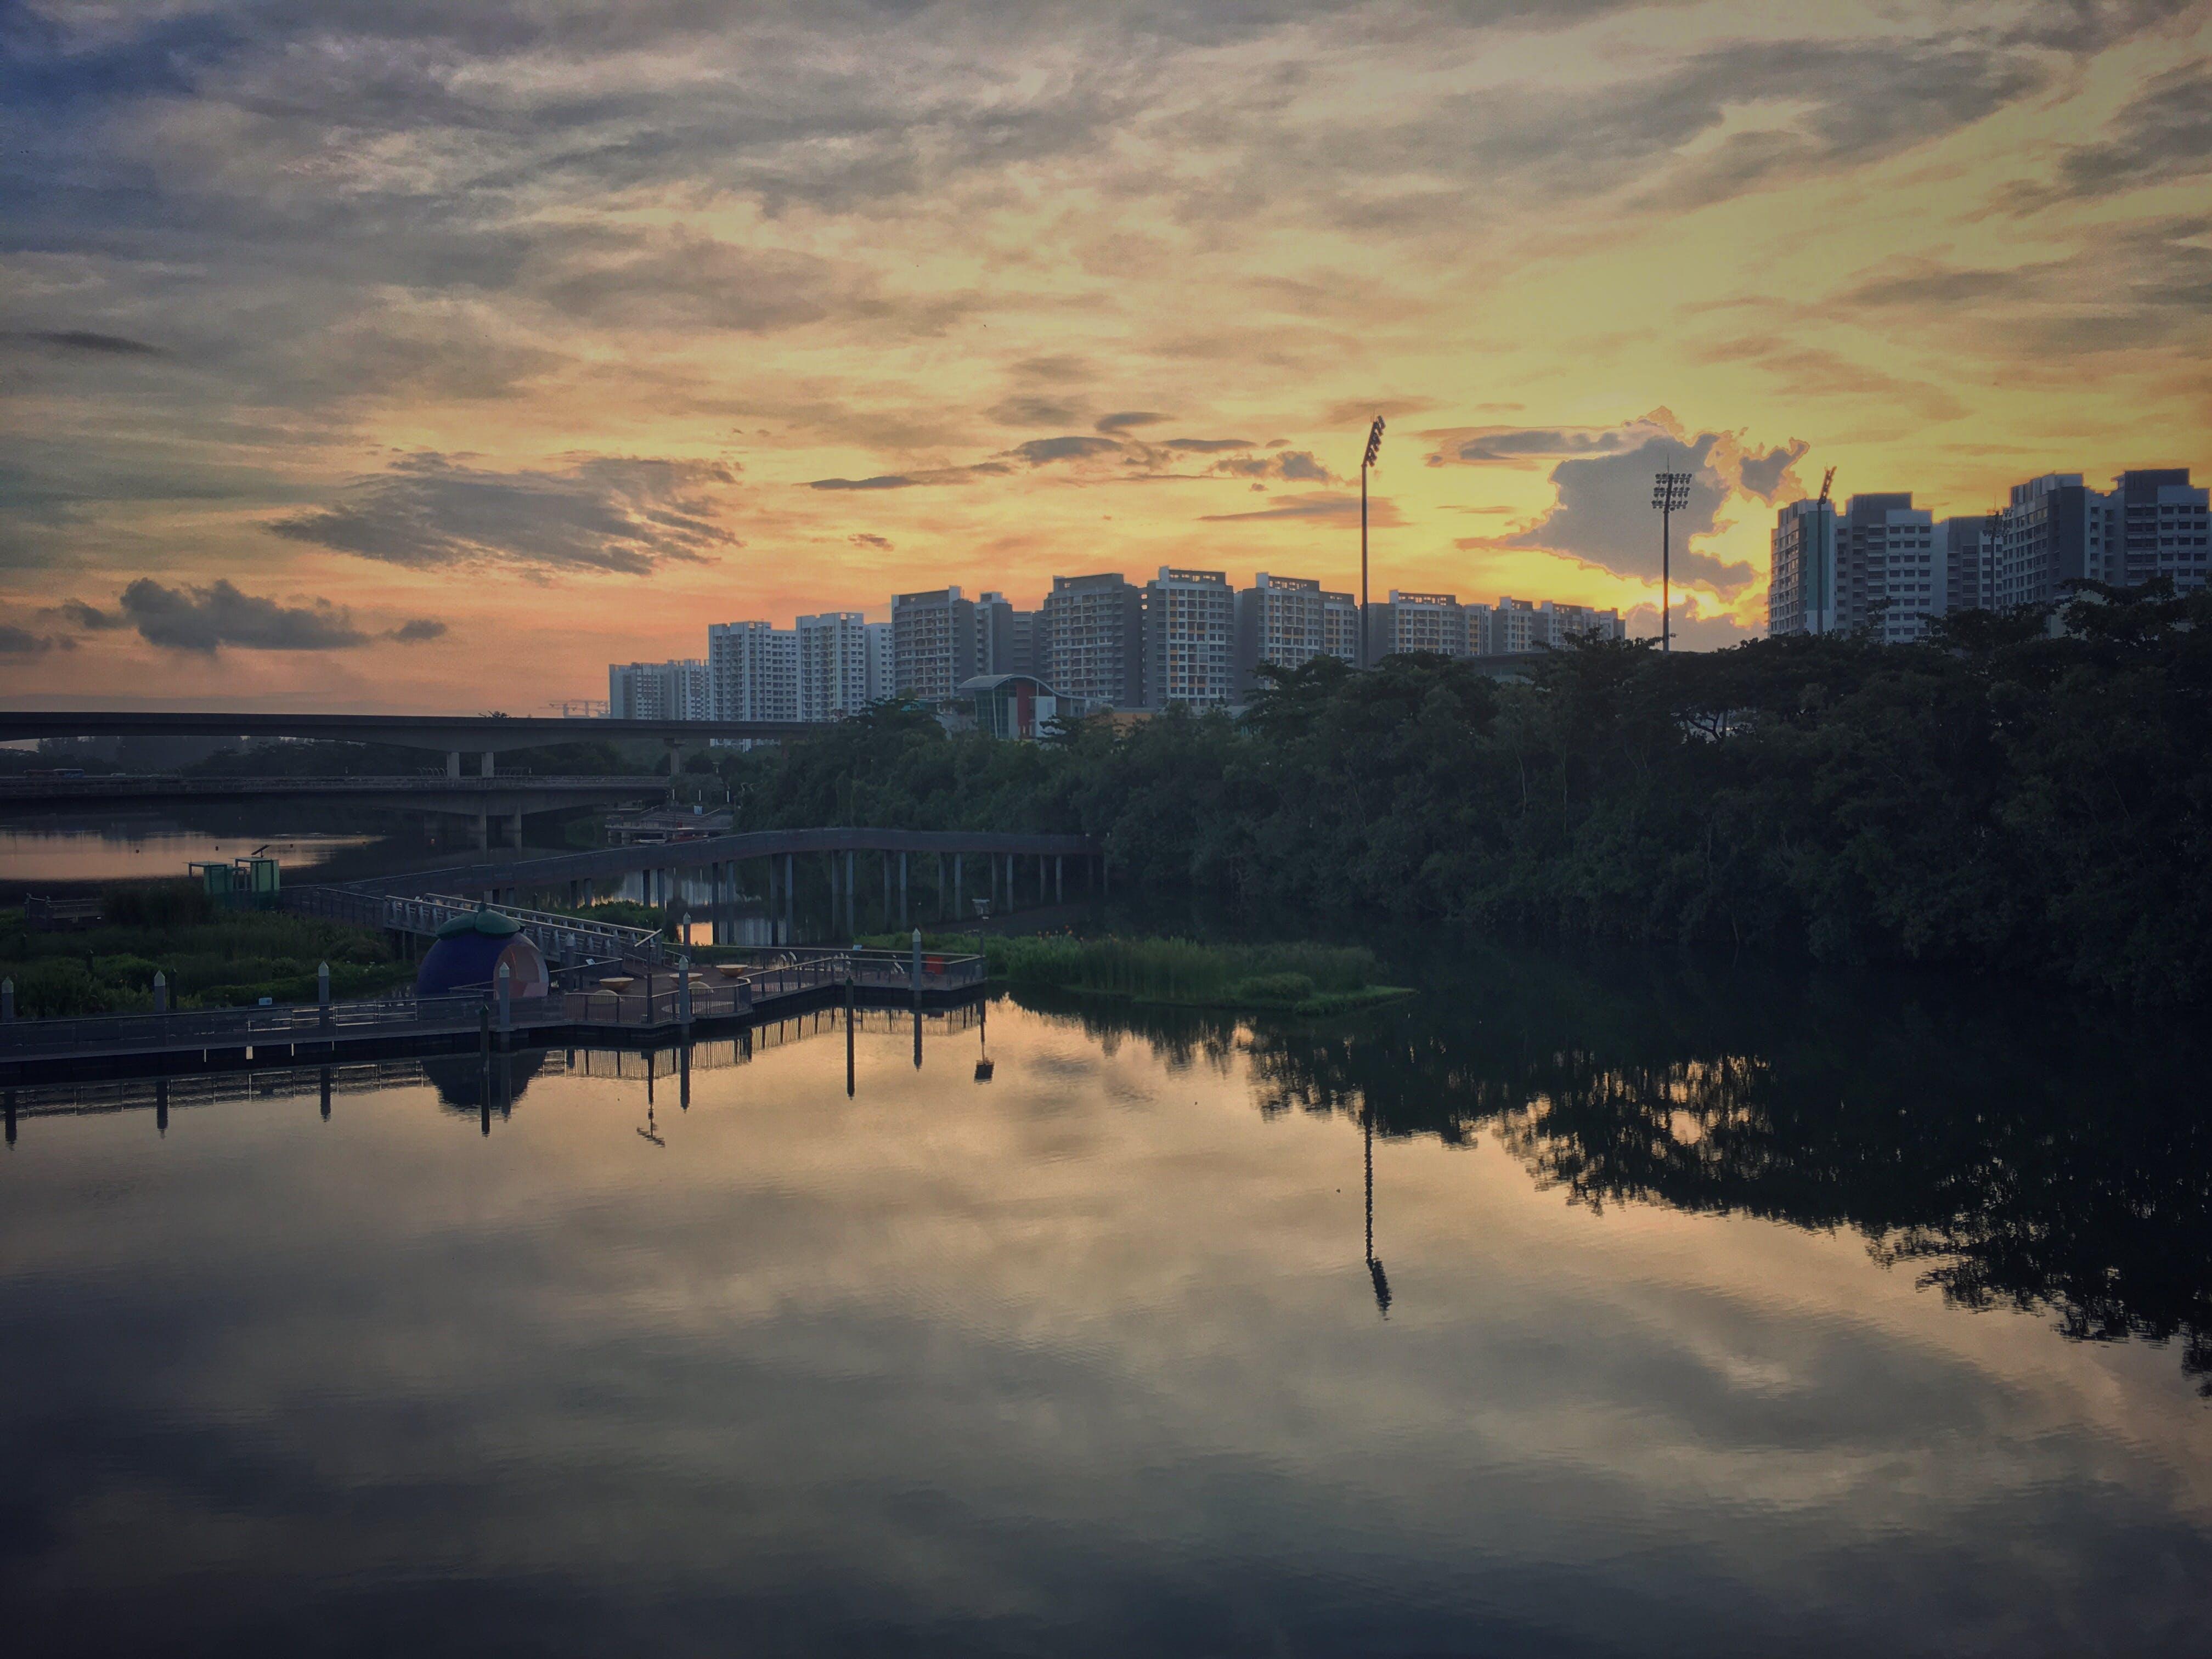 Free stock photo of Floating wetland, landscape, Riverside park, Sengkang